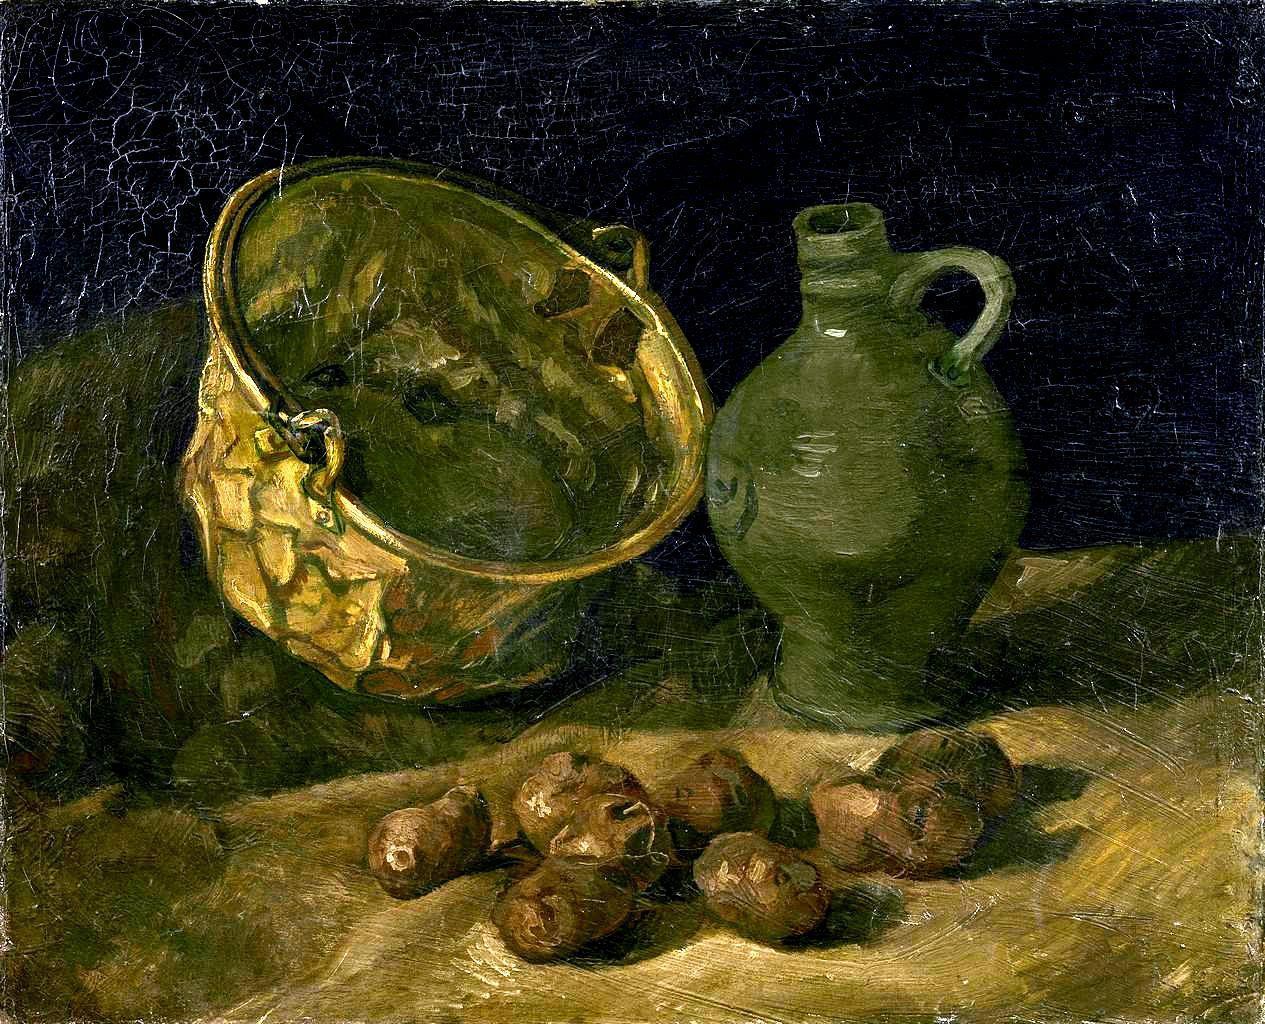 油画静物_有铜锅和壶的静物_Still Life with Brass Cauldron and Jug-文森特·梵高